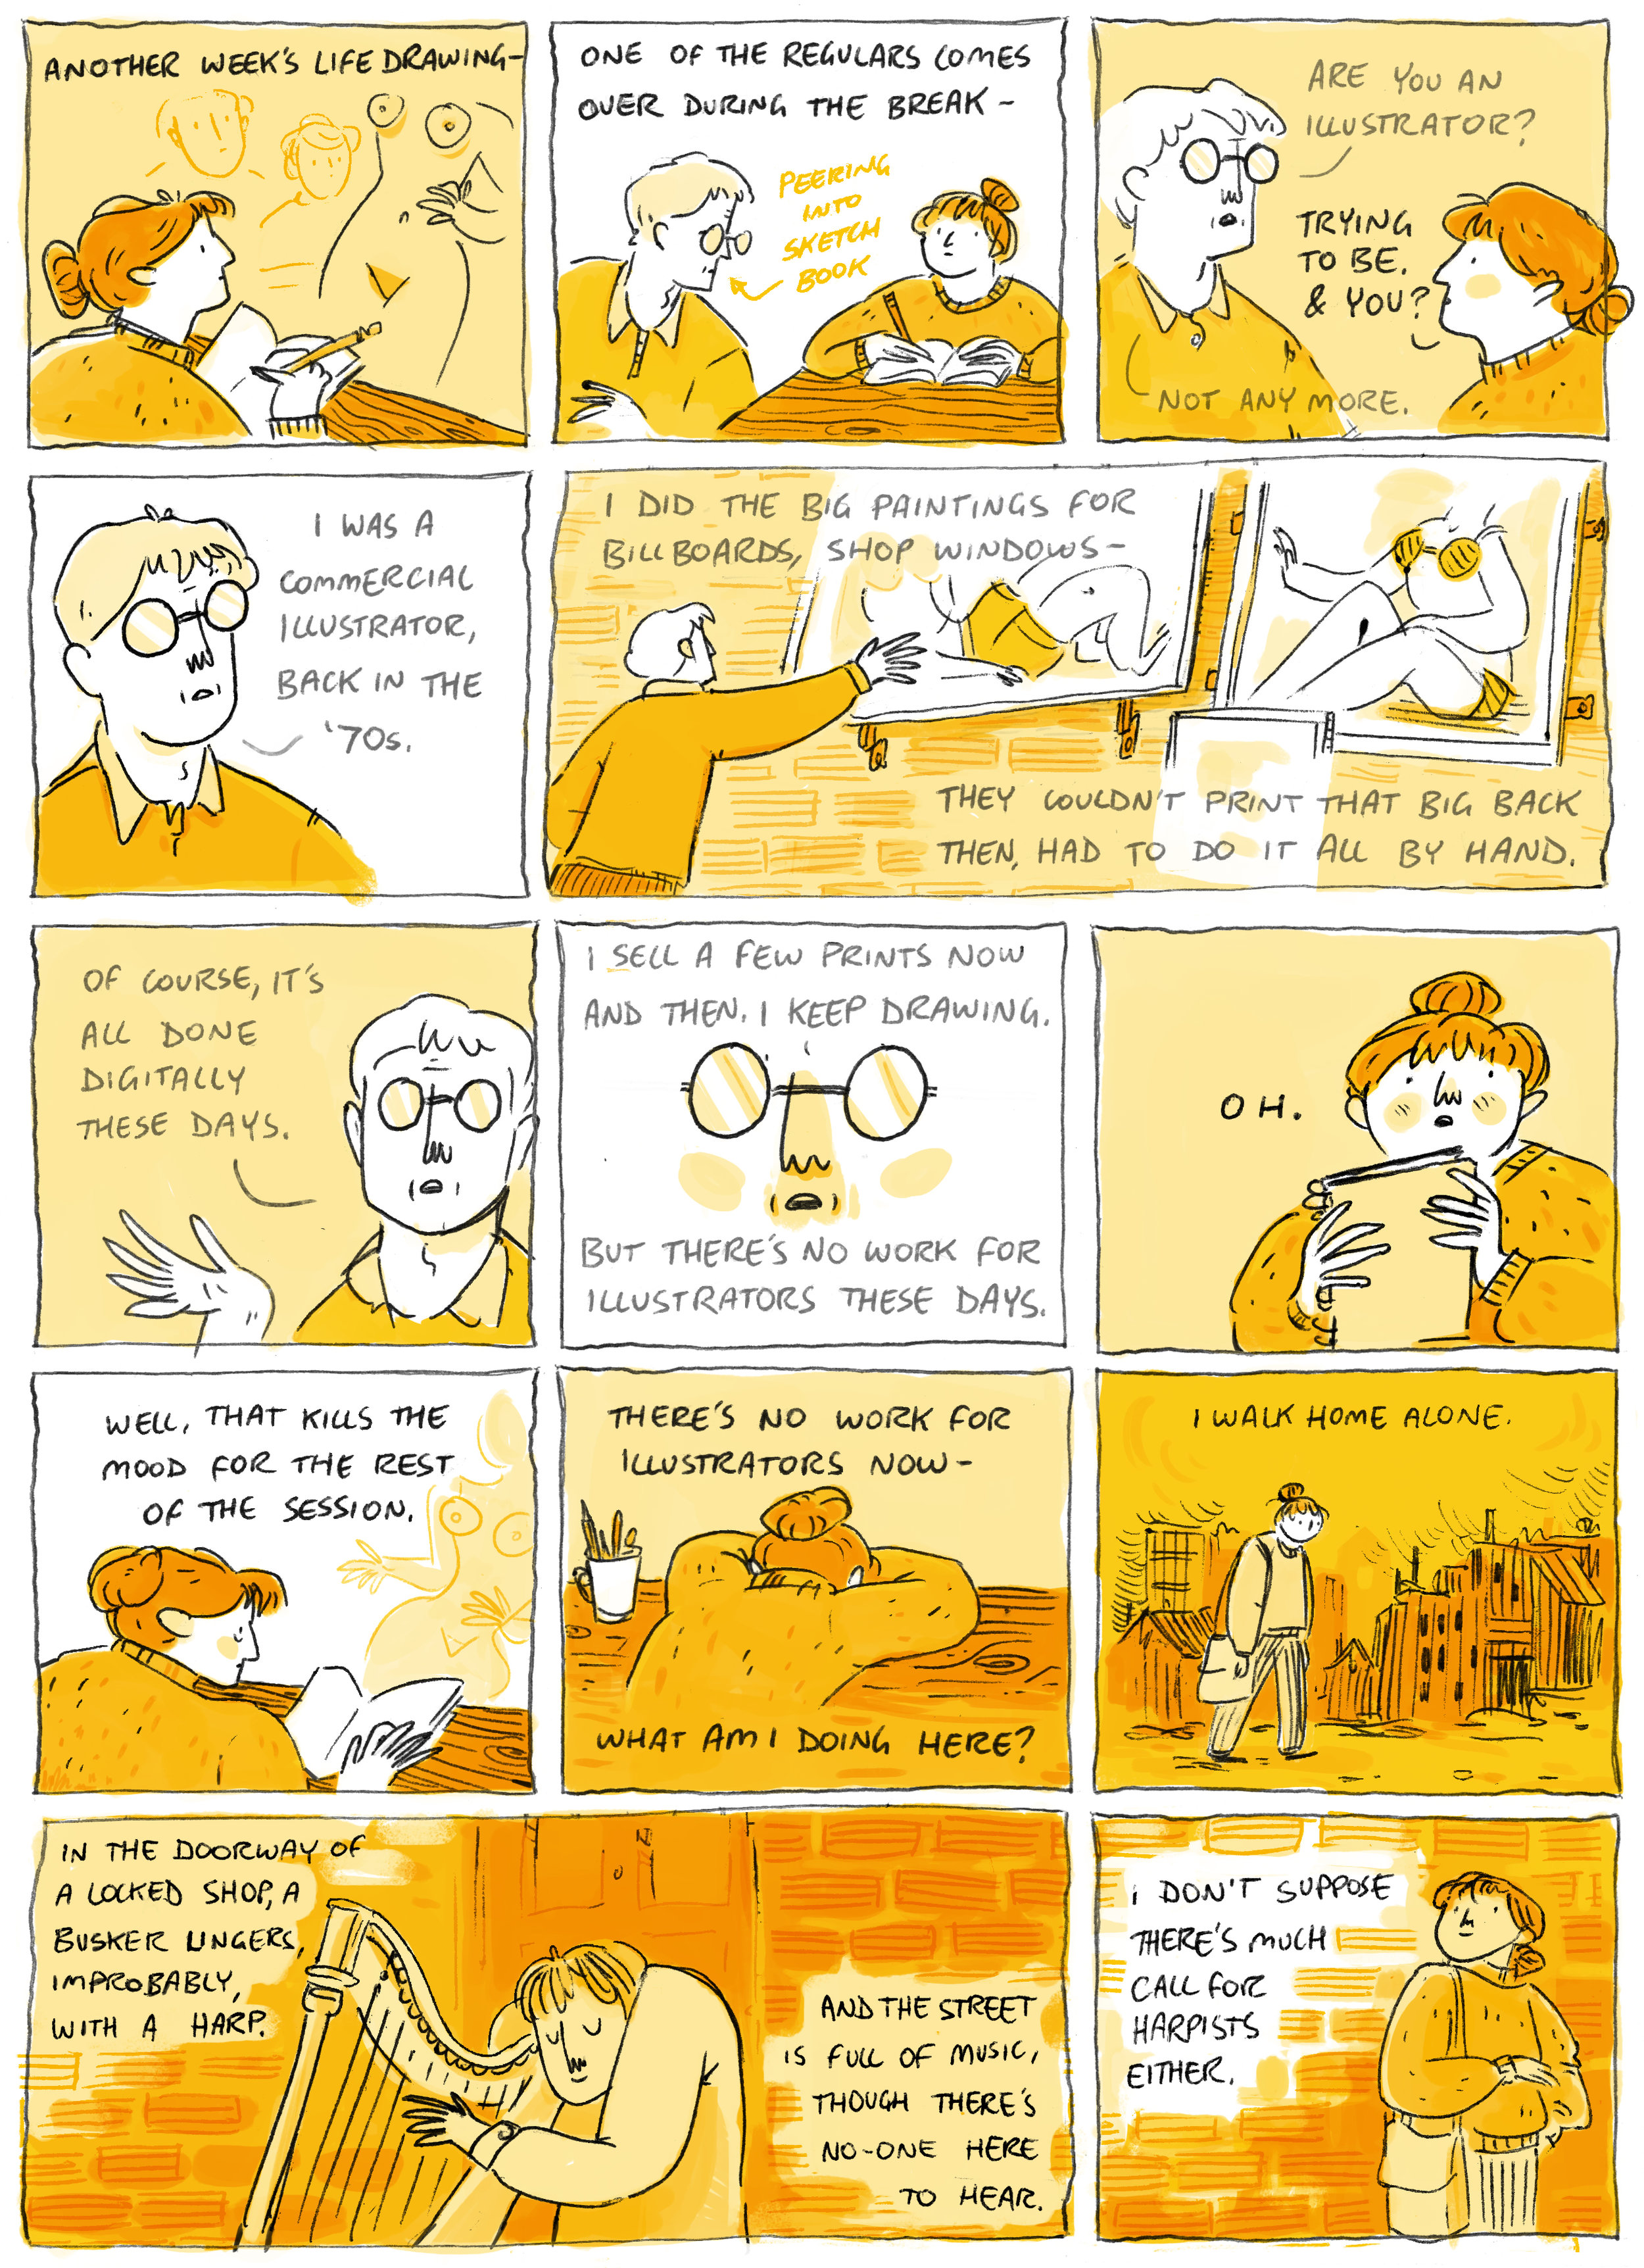 life drawing comic 1.jpg